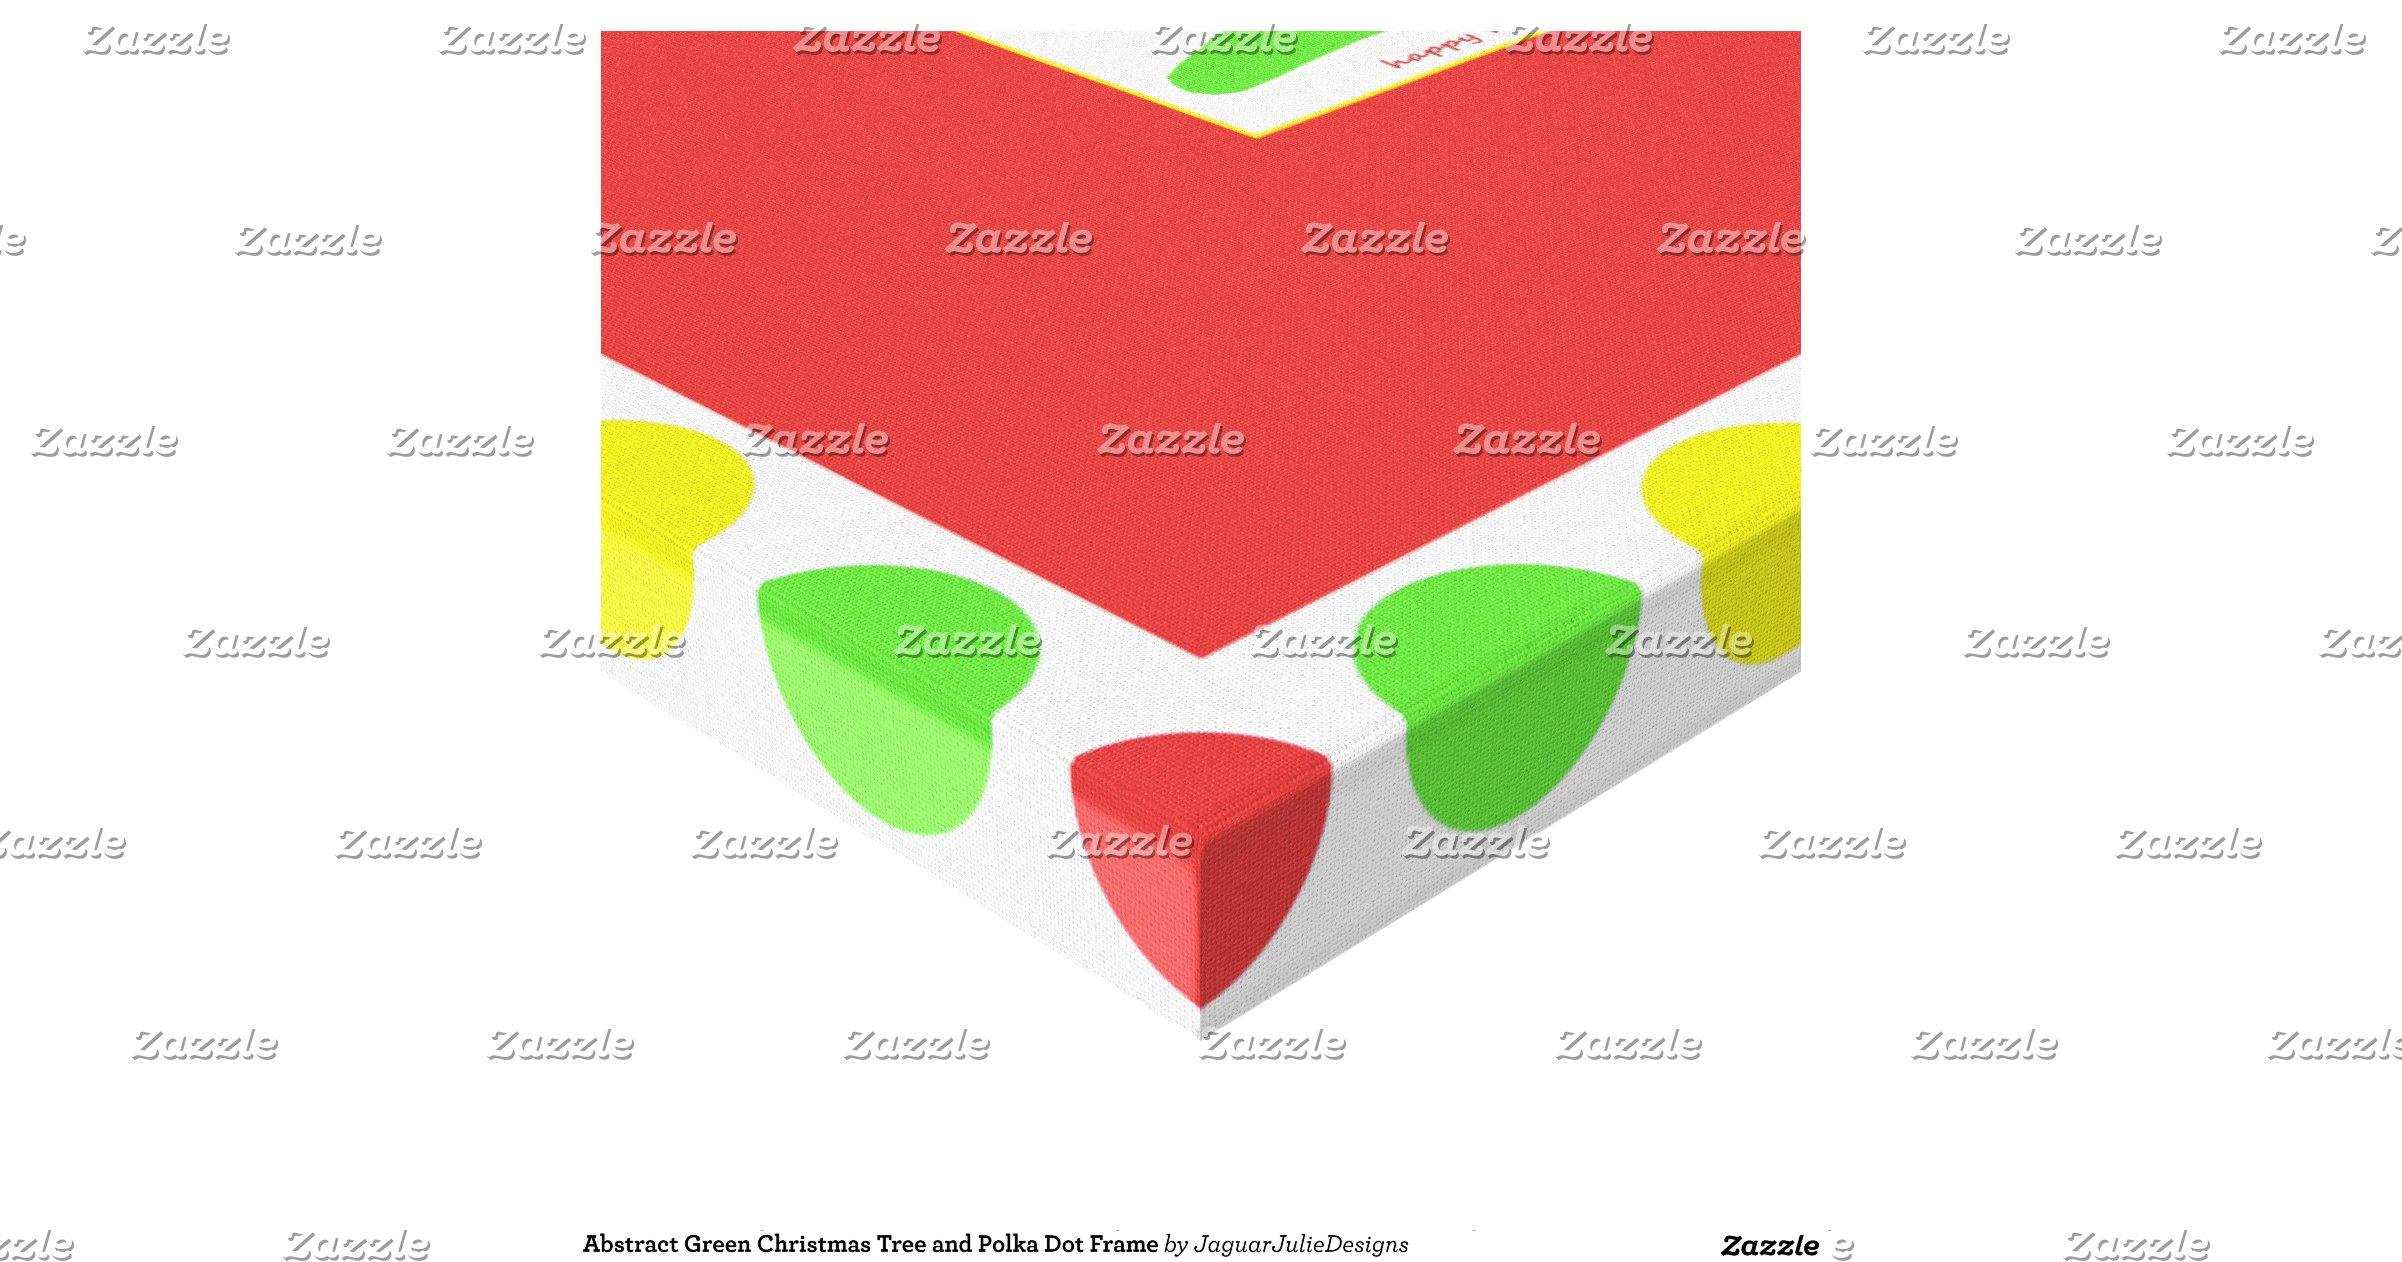 Abstract Green Christmas Tree And Polka Dot Frame Gallery